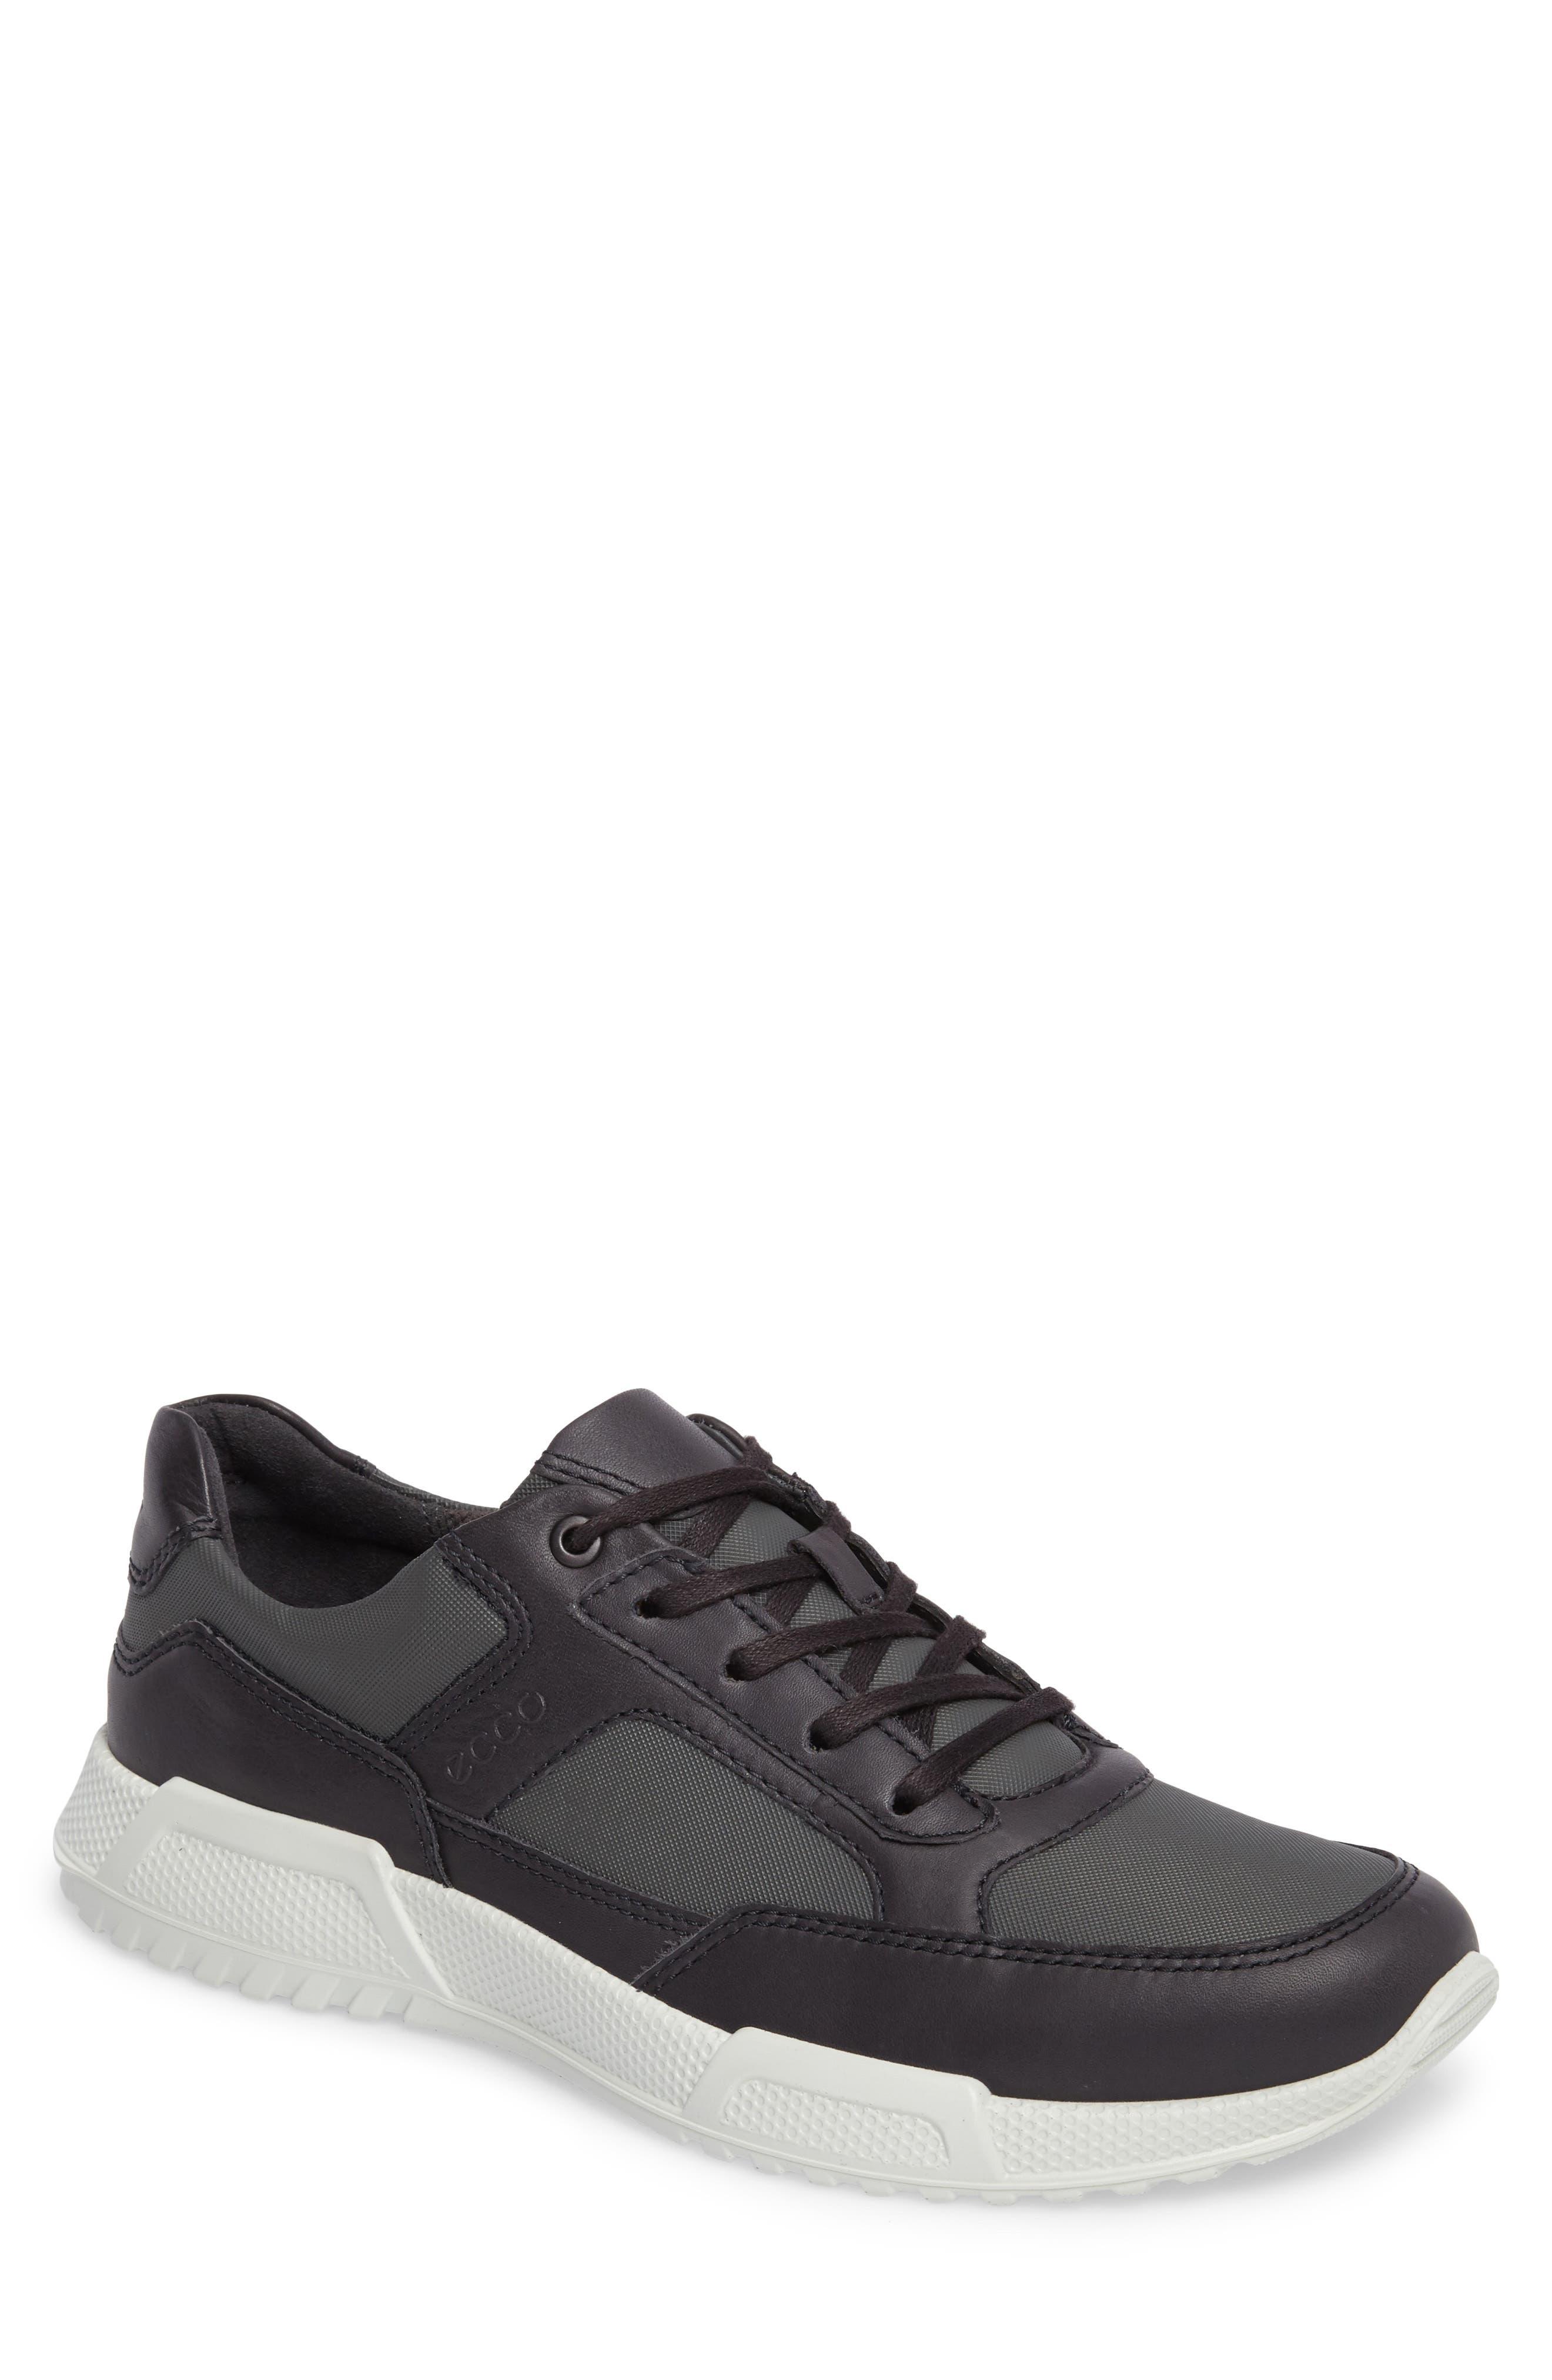 ECCO Luca Sneaker (Men)